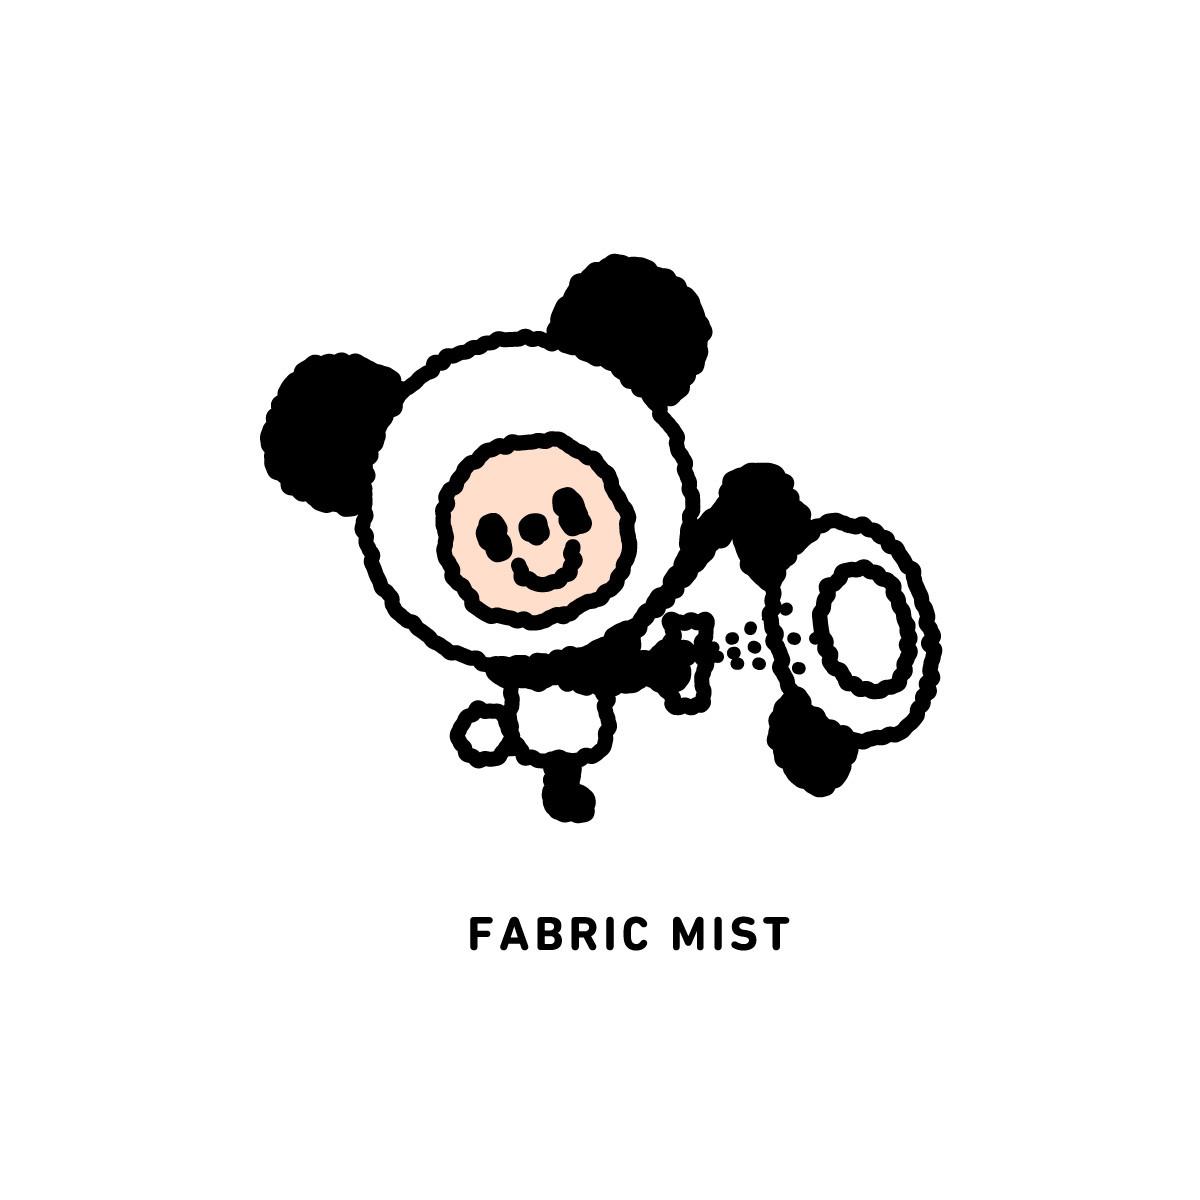 bebeboo-char-sample-fabricmist.jpg